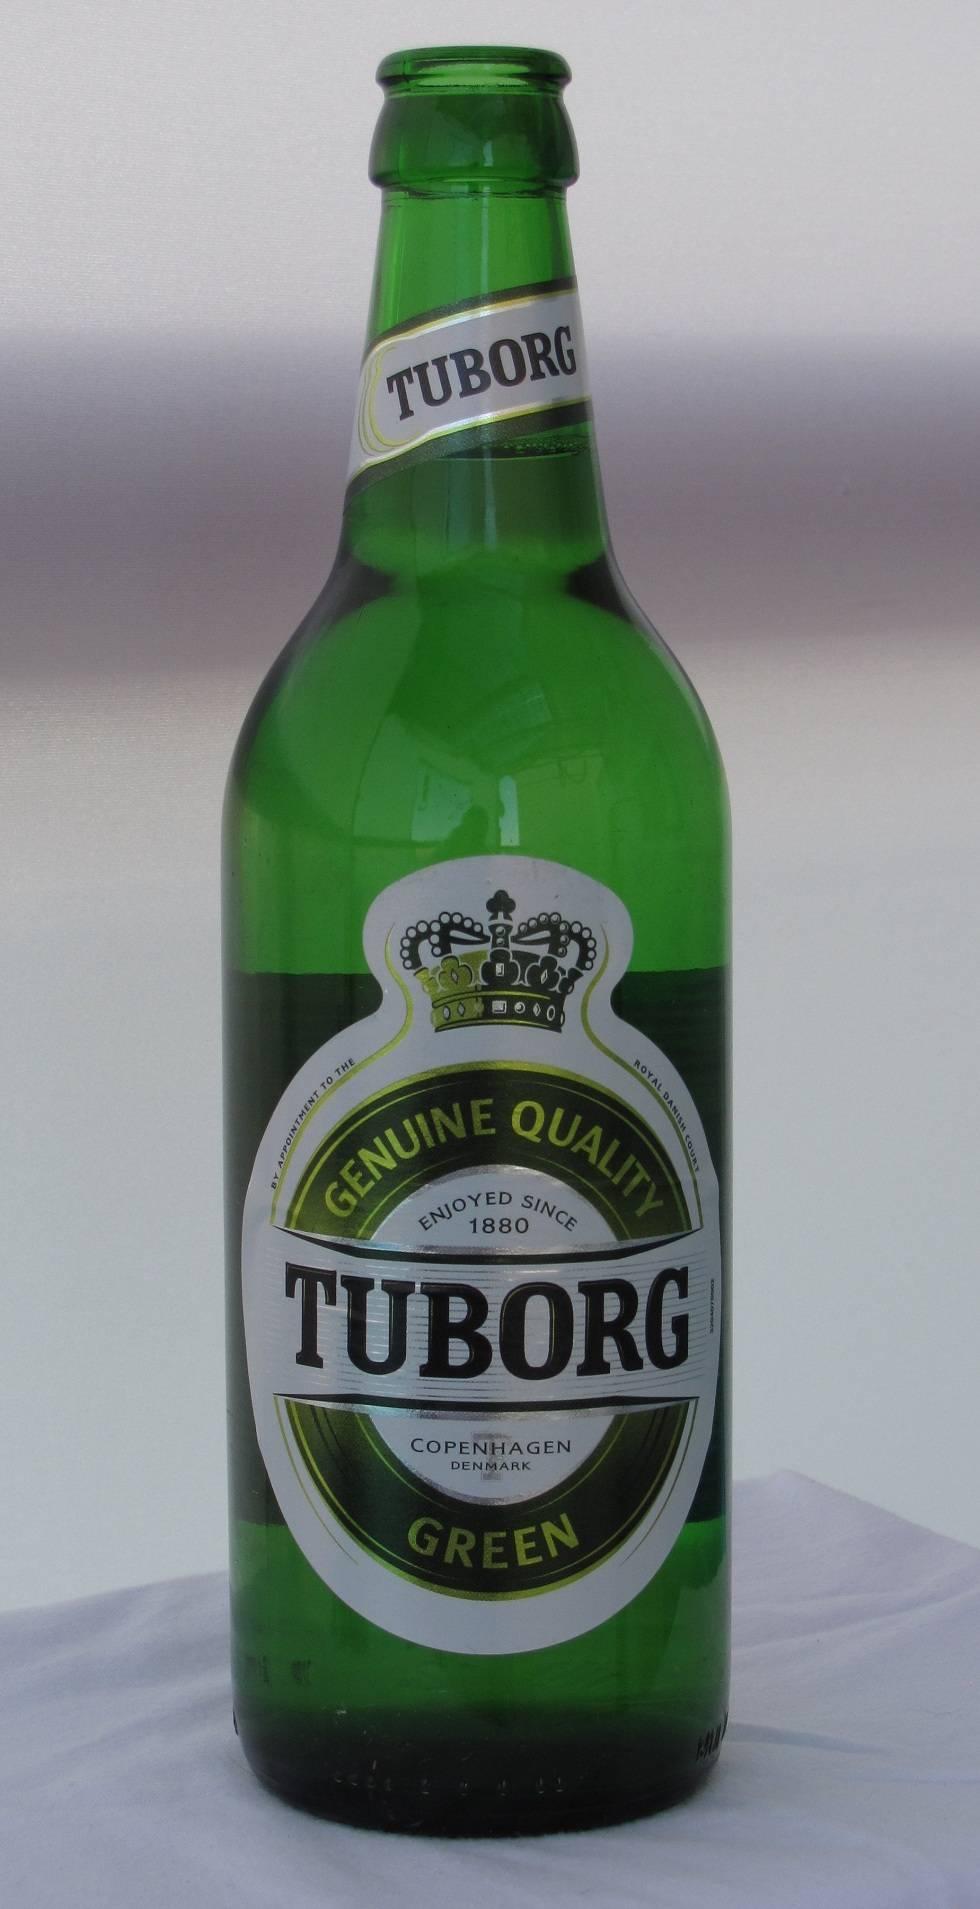 Пиво туборг и его особенности